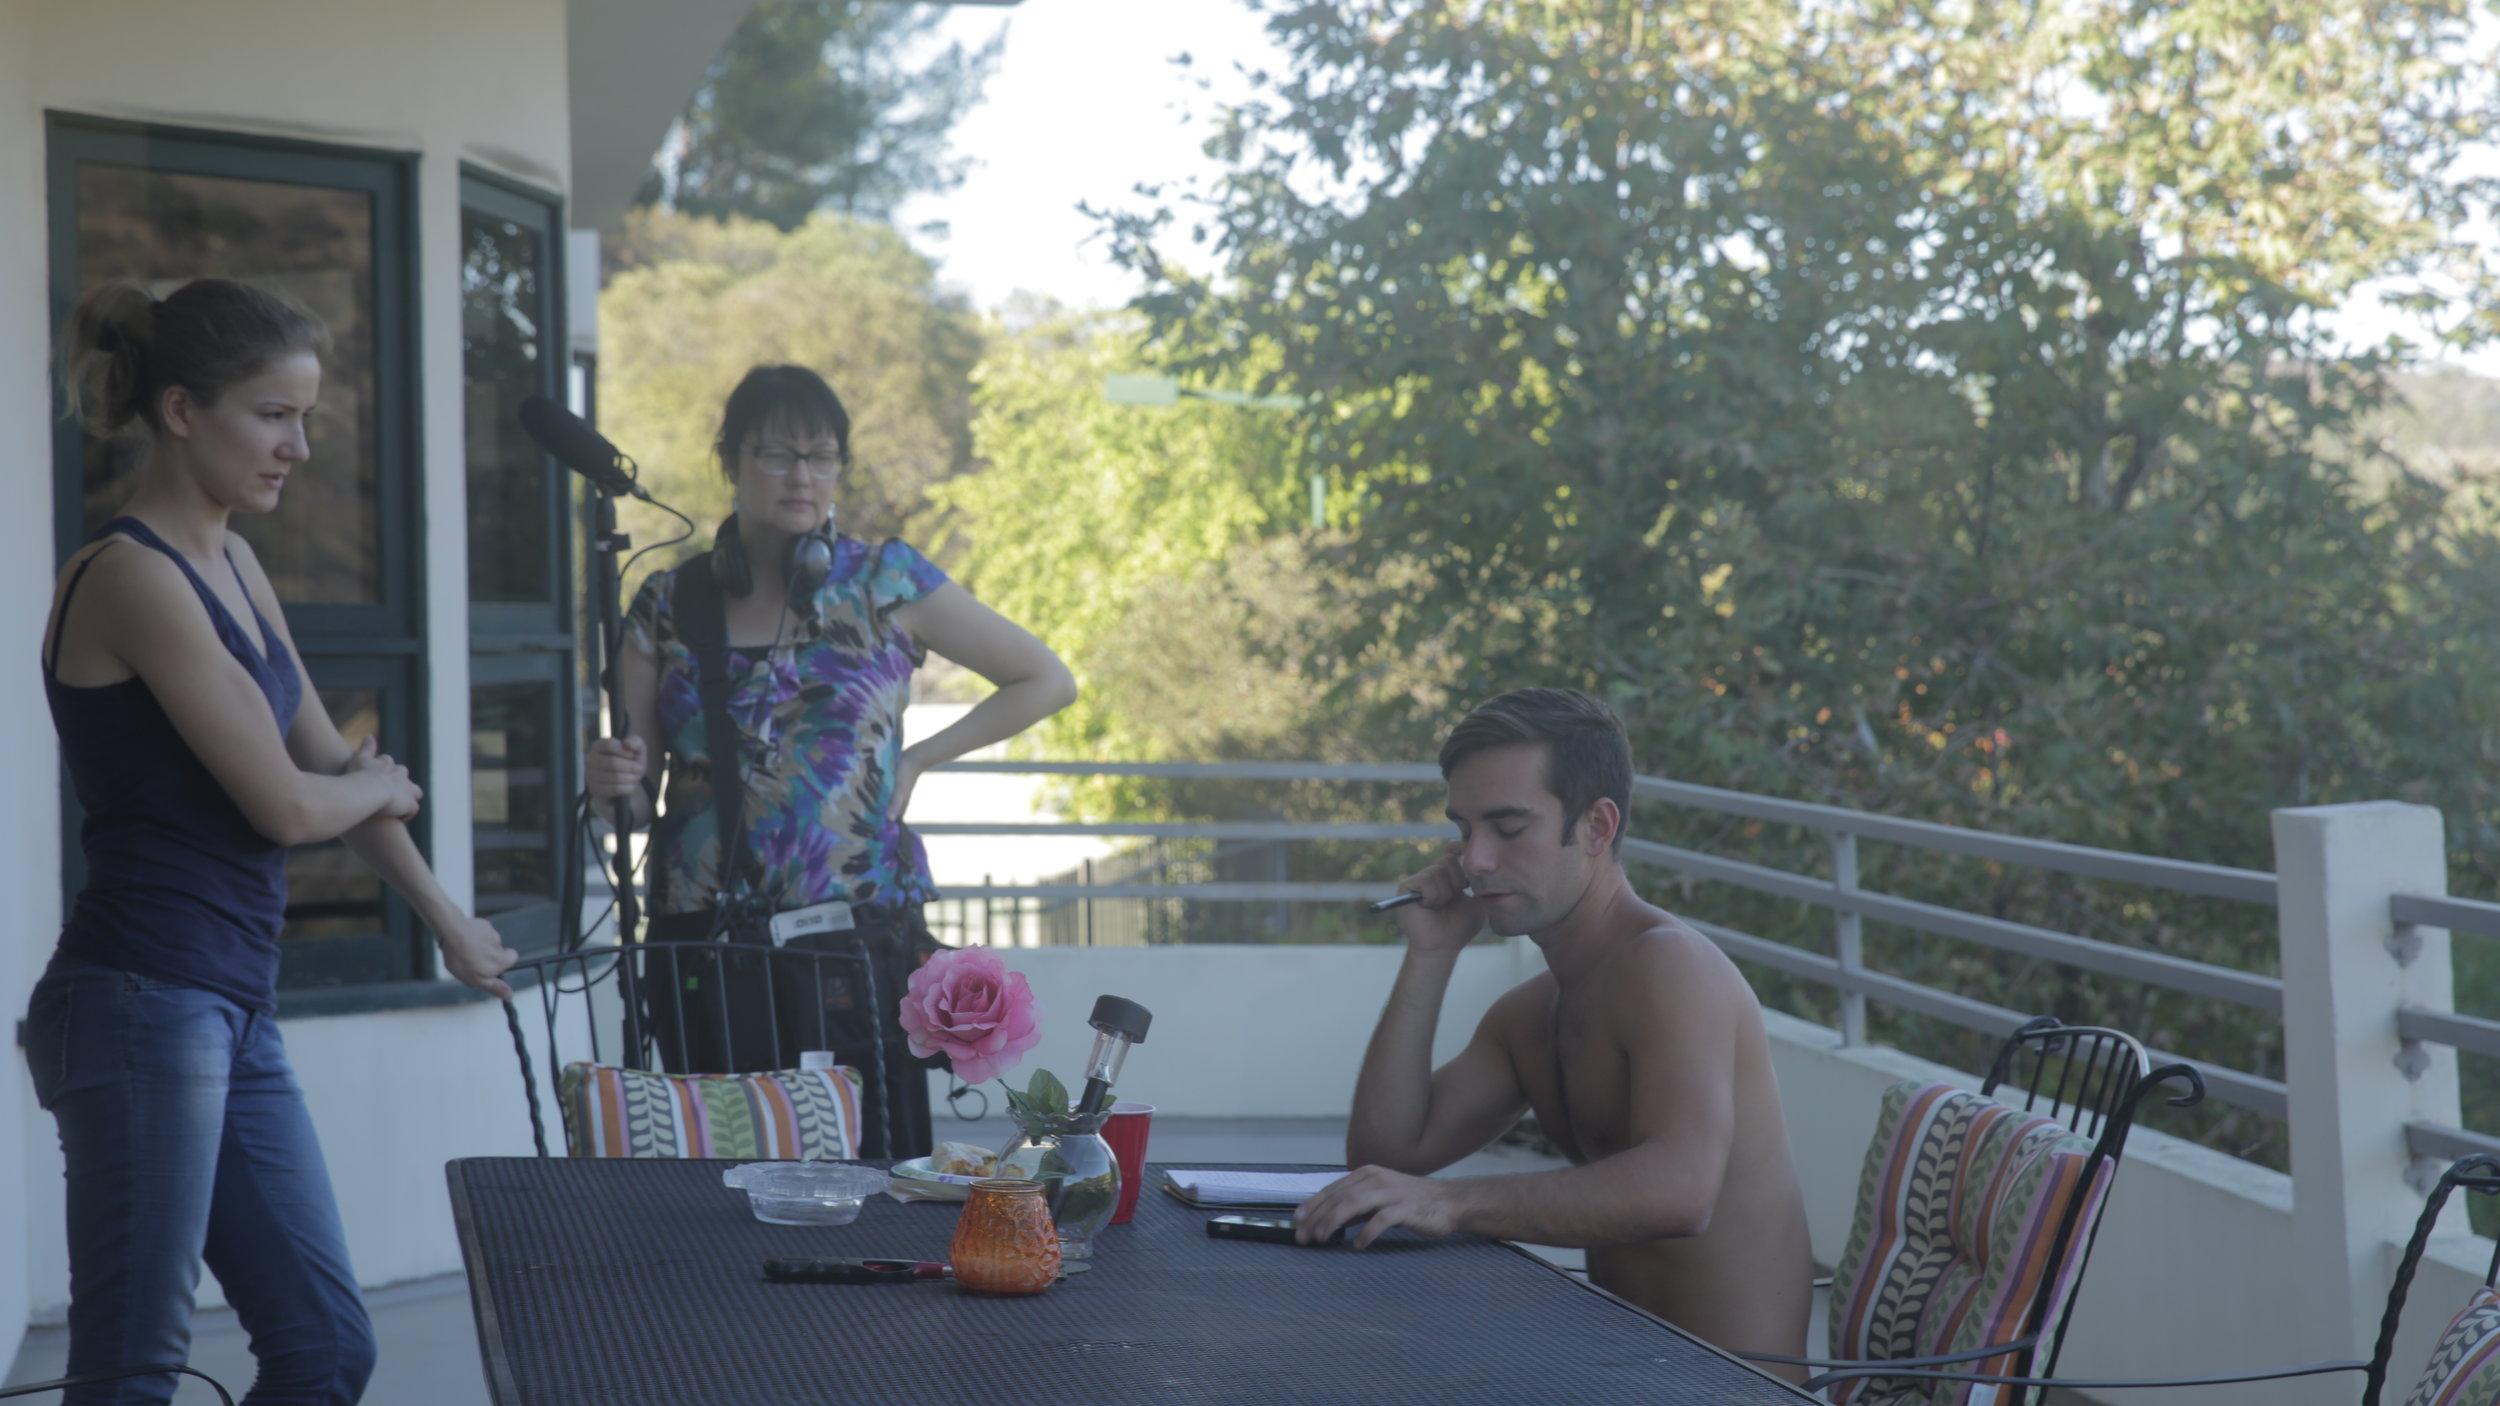 Love In Porn - Behind The Scenes: Director/Producer Kseniya Yorsh at left.